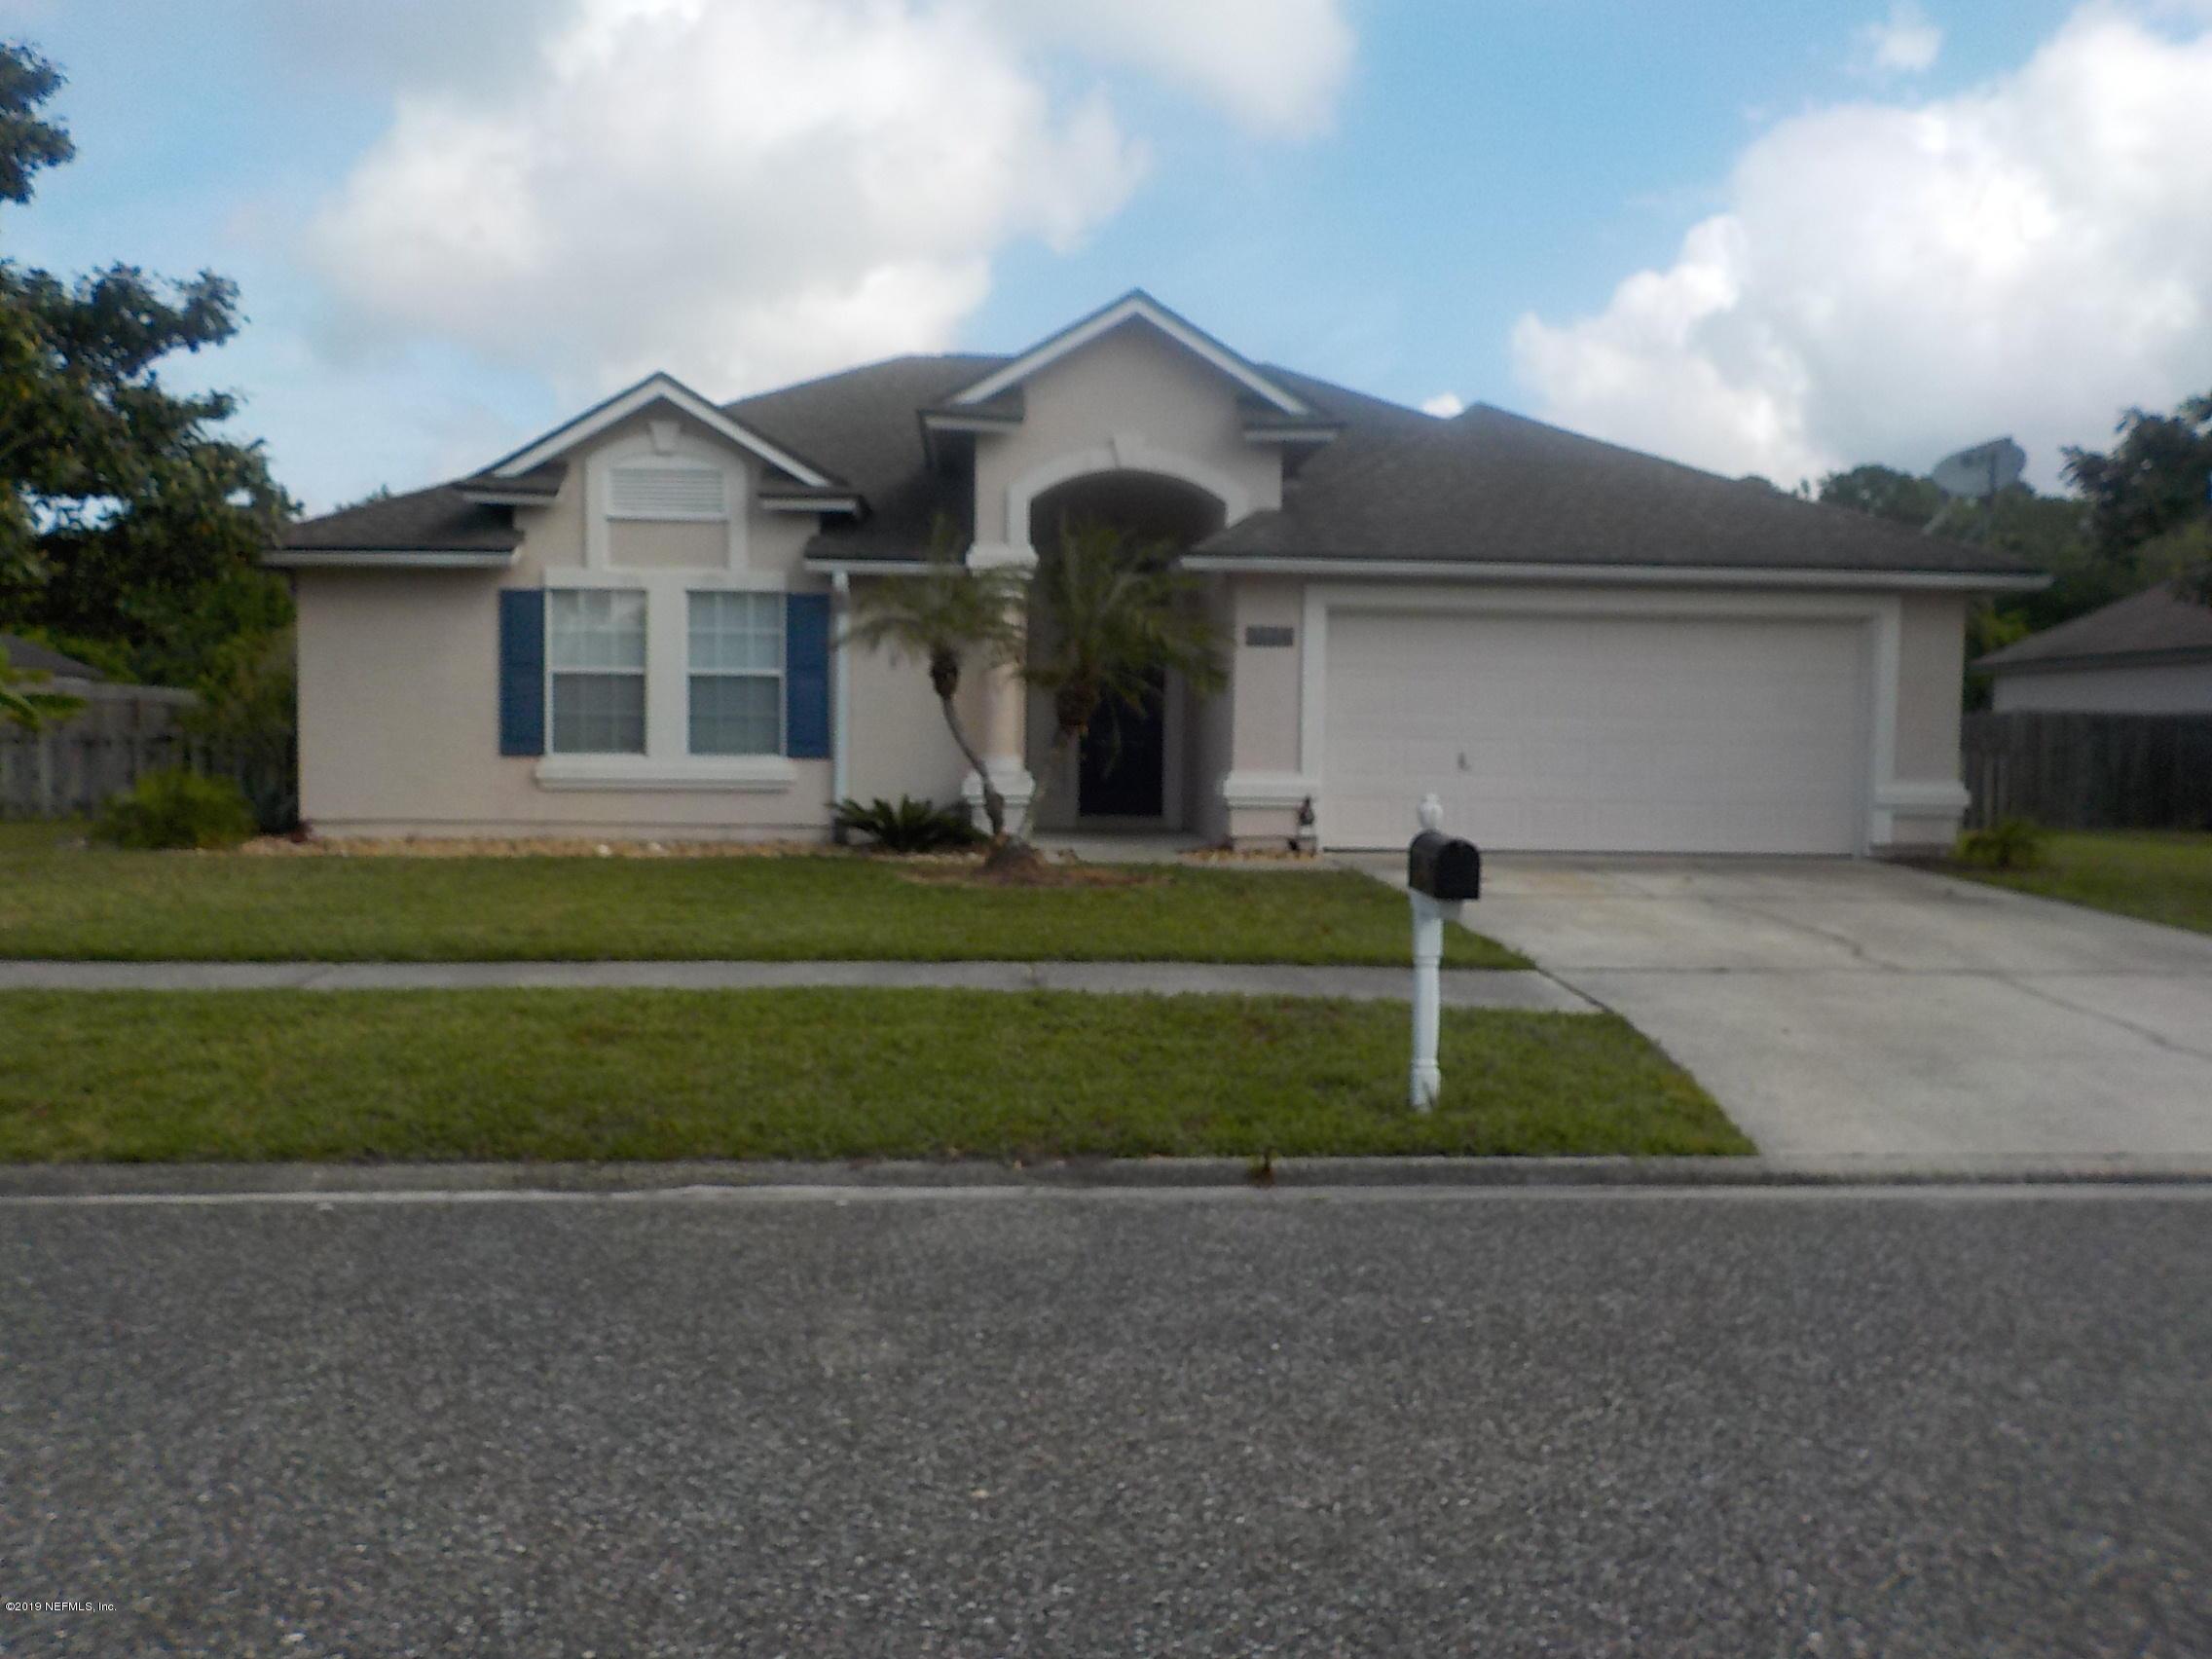 1624 HAMPTON, FLEMING ISLAND, FLORIDA 32003, 3 Bedrooms Bedrooms, ,2 BathroomsBathrooms,Residential - single family,For sale,HAMPTON,988891